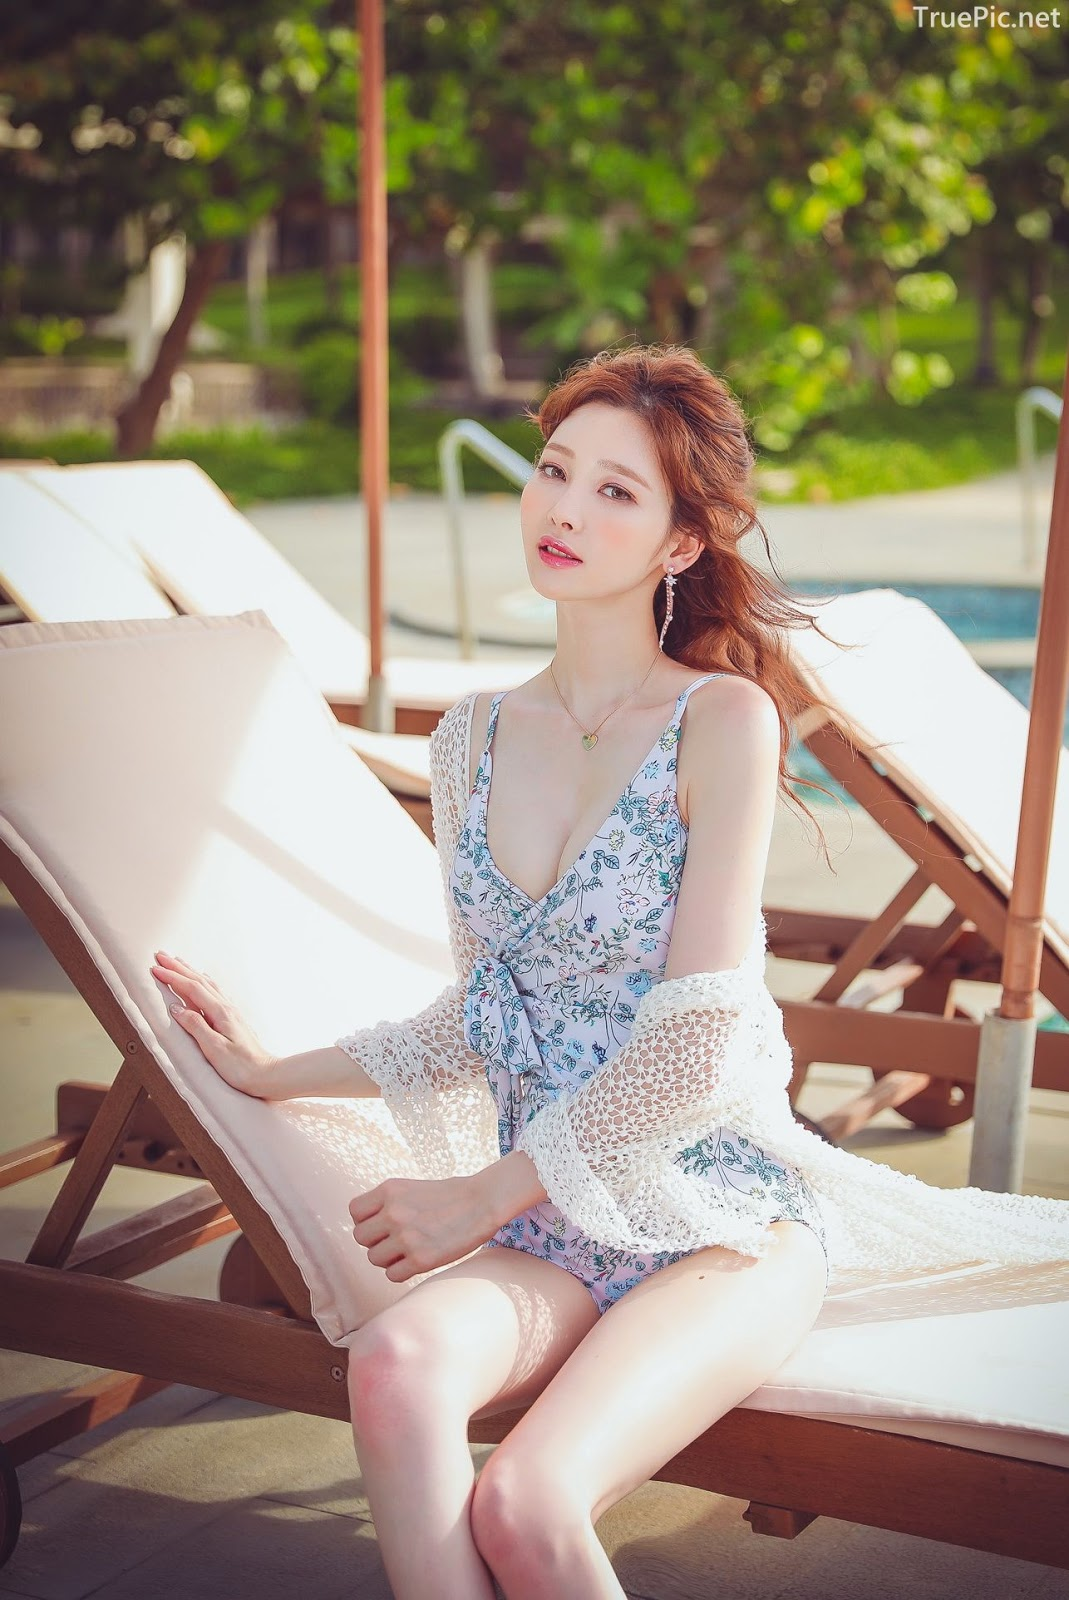 Korean lingerie queen Kim Hee Jeong - Floral Blue Monokini Swimsuit Set - Picture 4